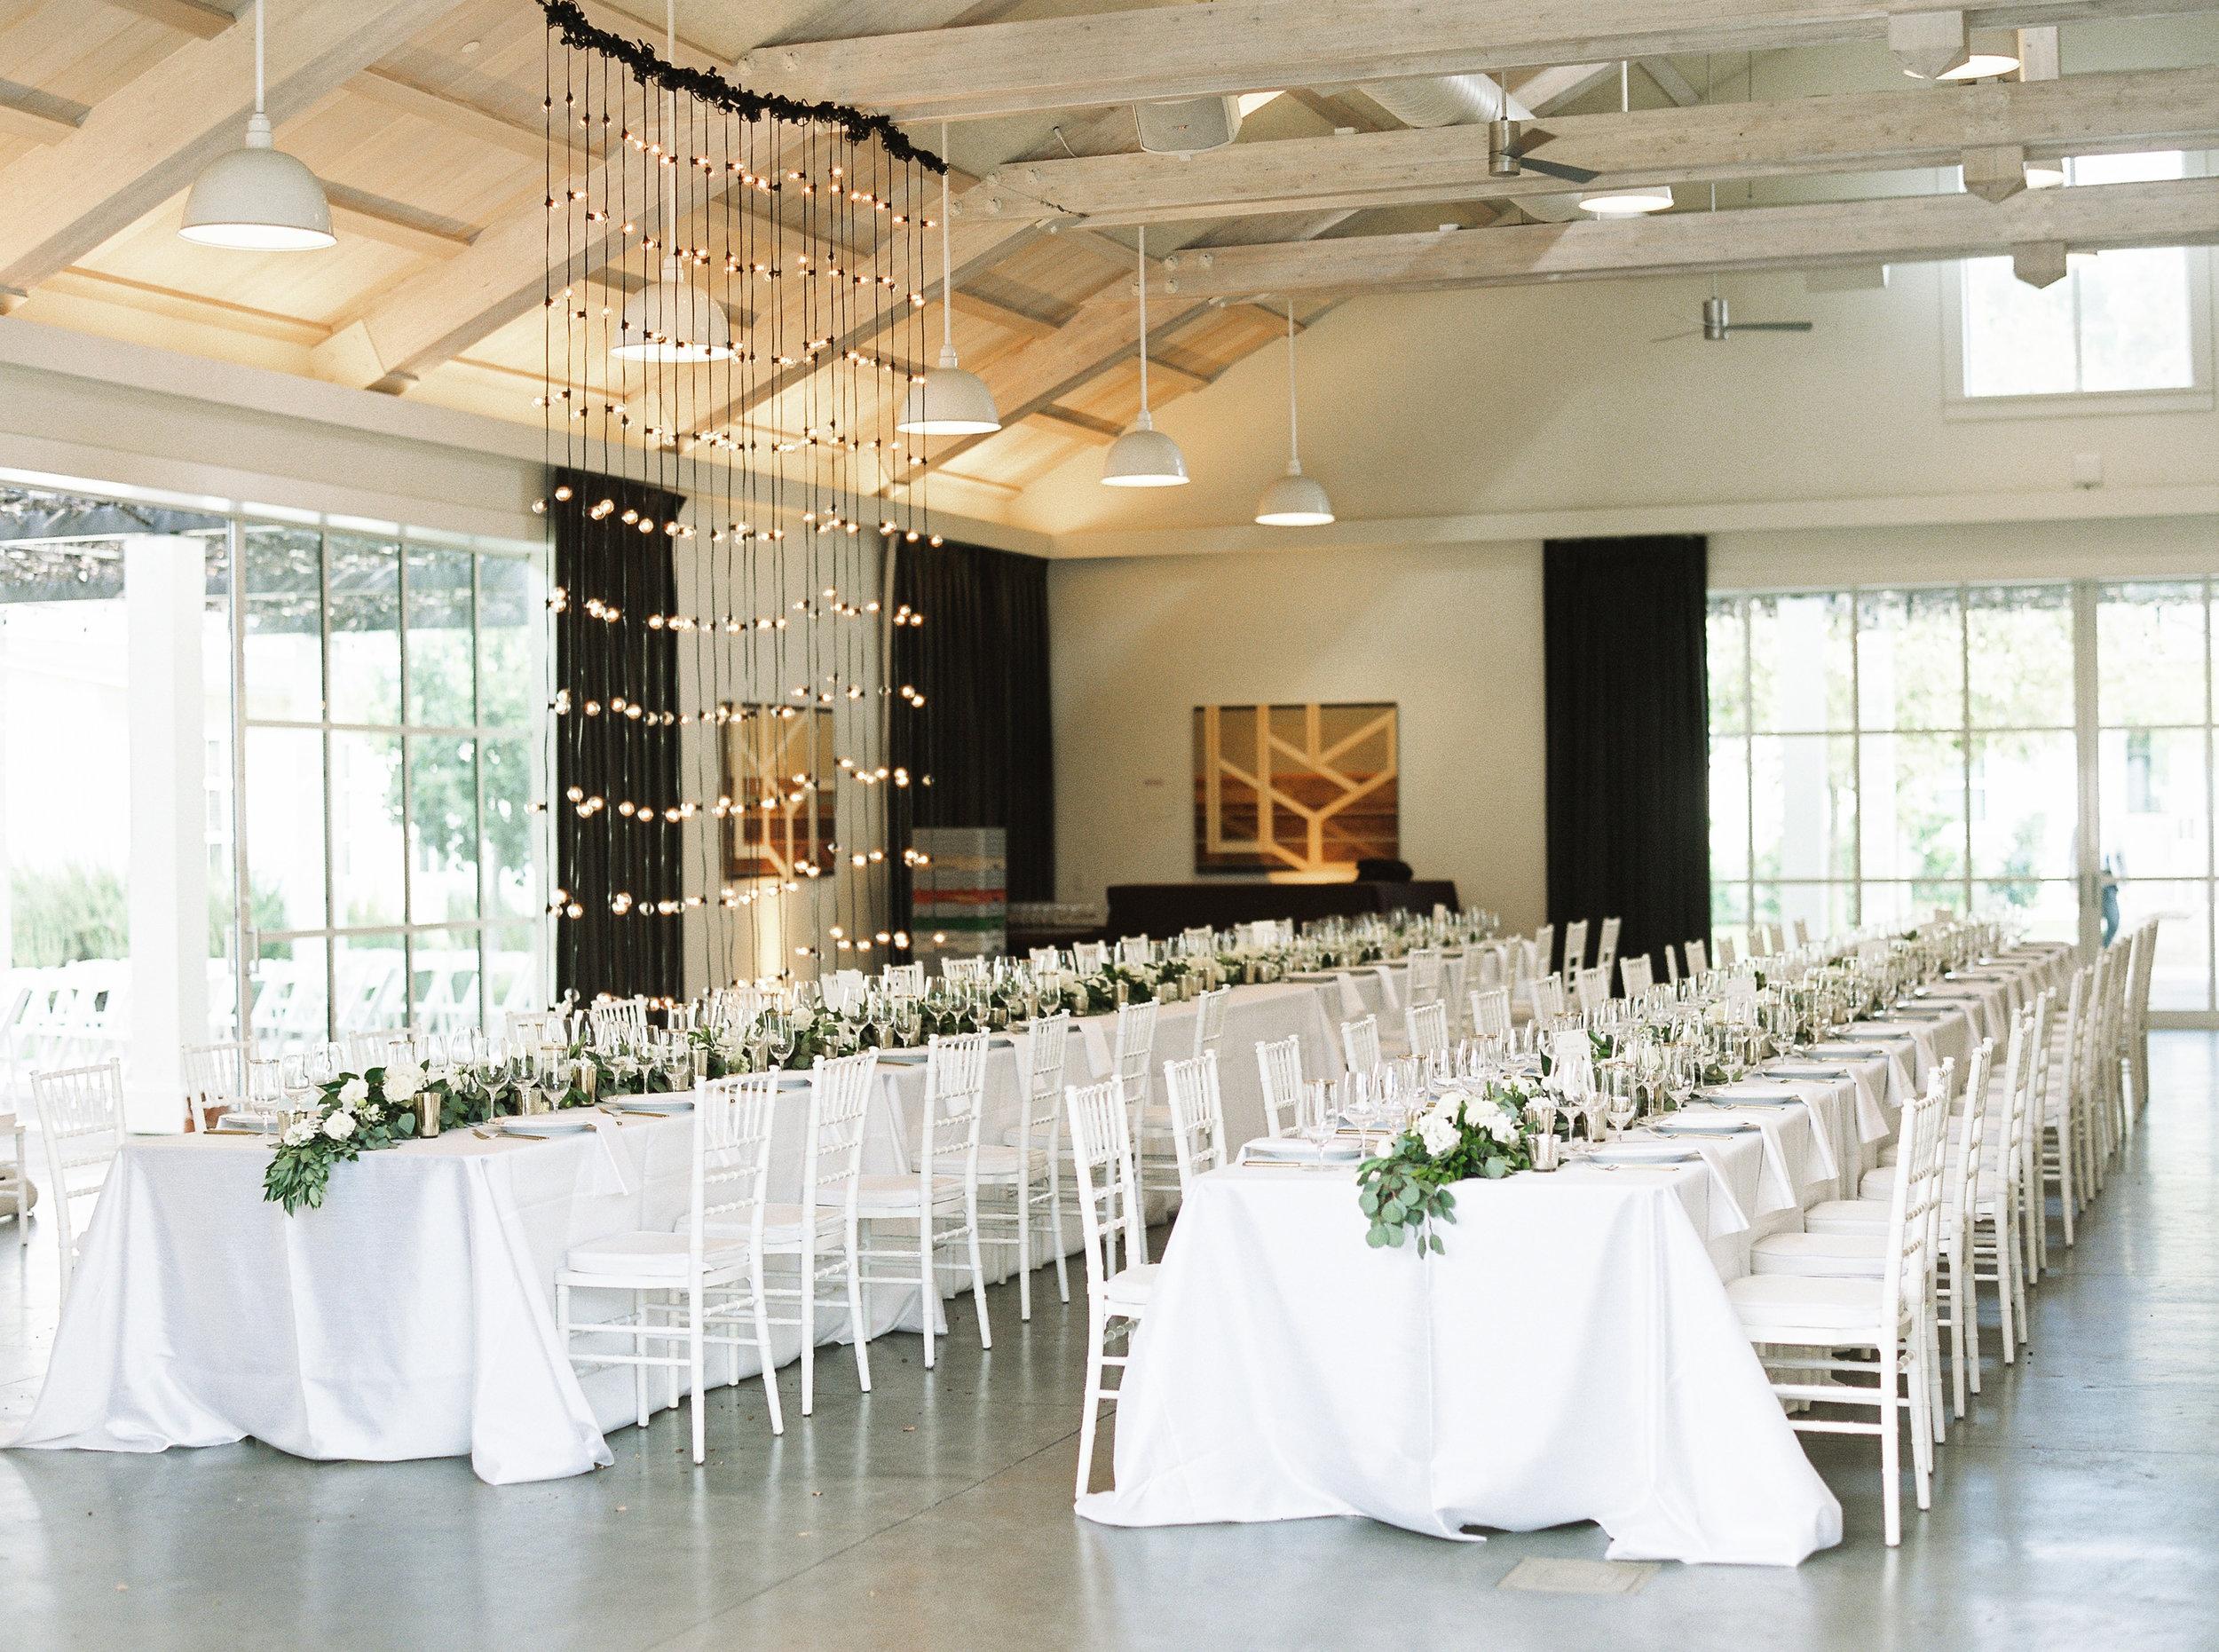 solage-calistoga-wedding-1-14.jpg